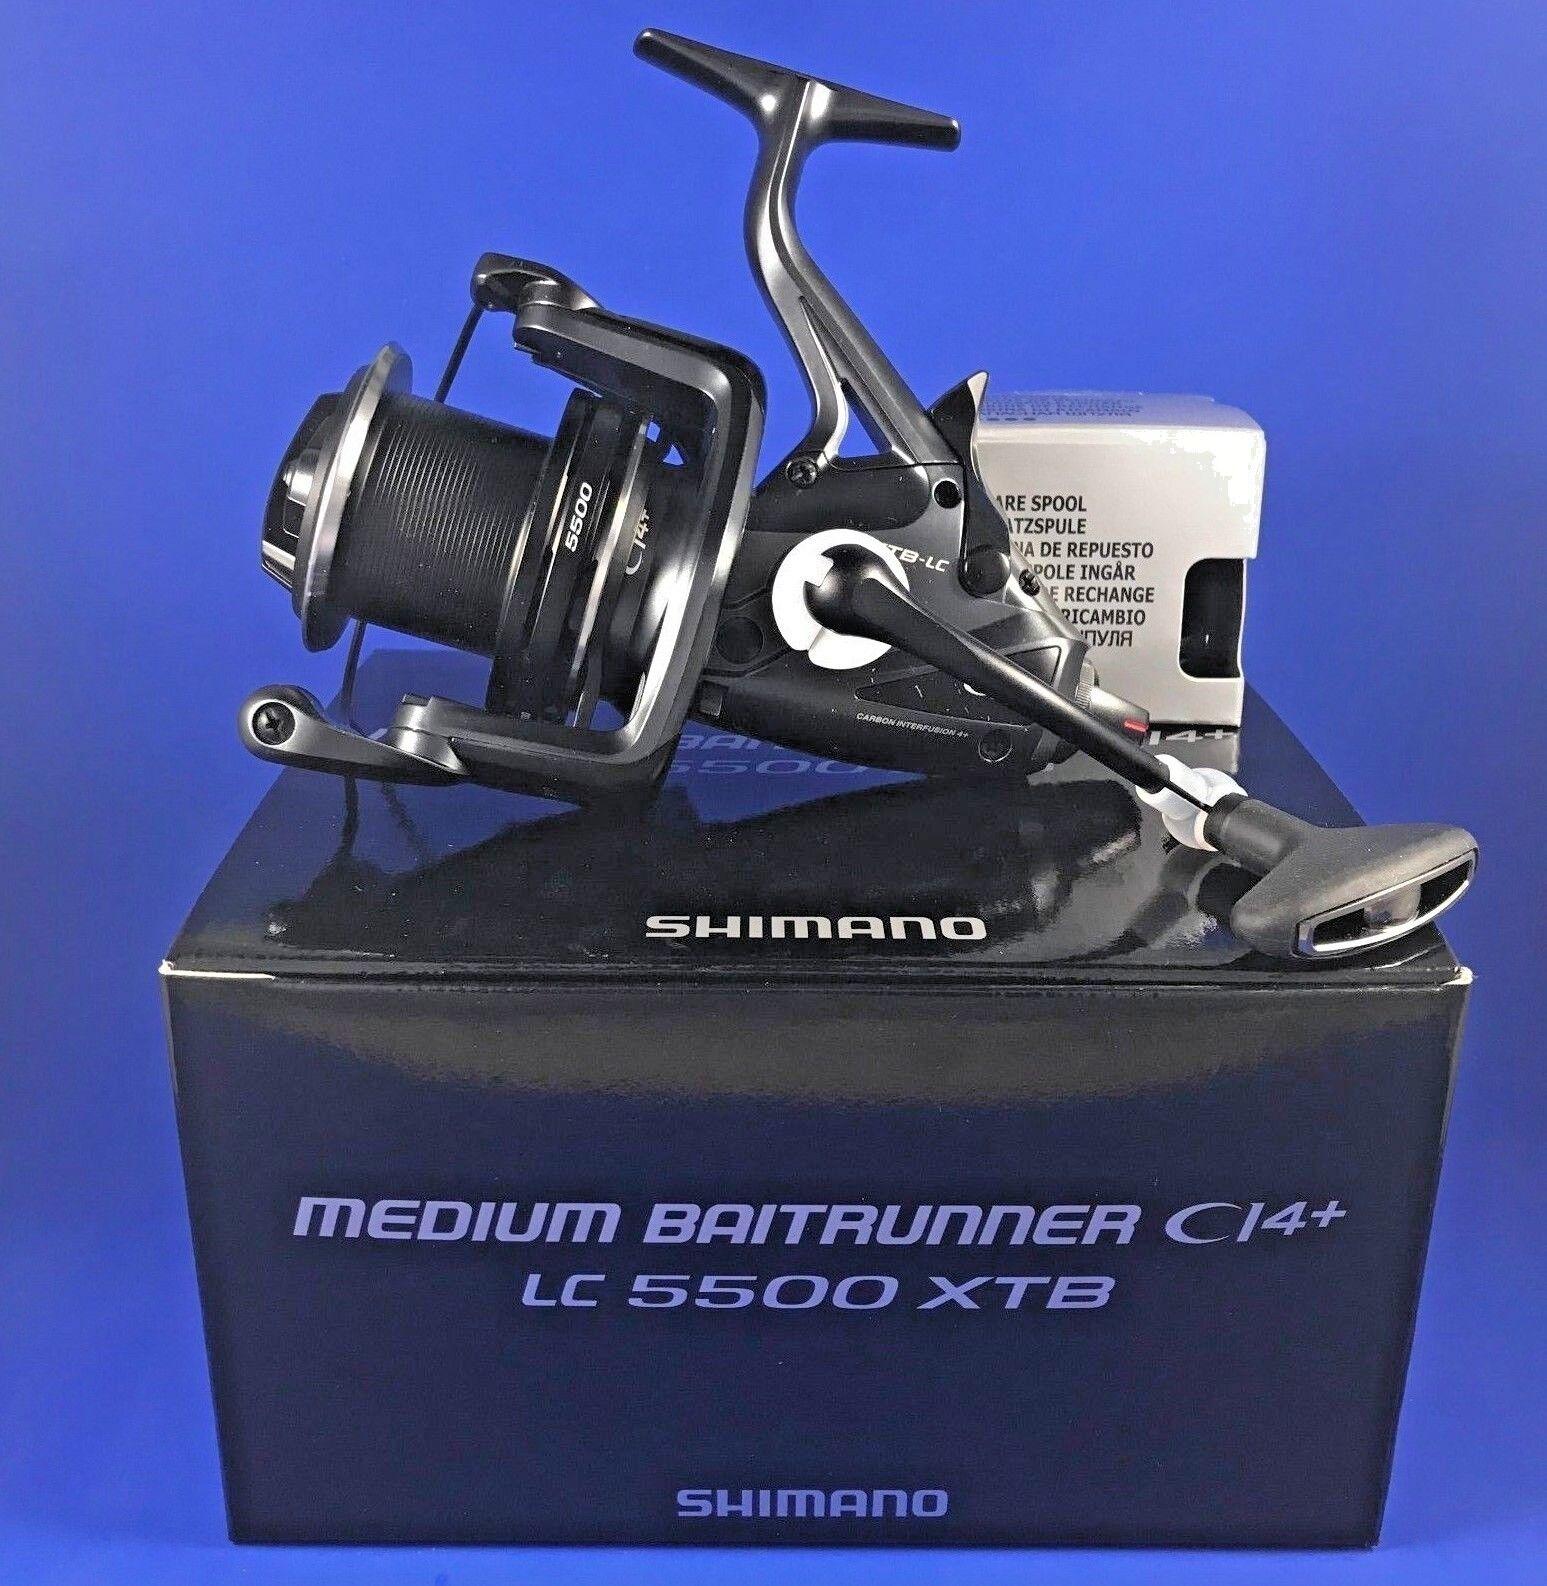 Medio Shimano Baitrunner Ci4+ Xt-b largo elenco    mbtrci 4 xtblc    Reel De Pesca